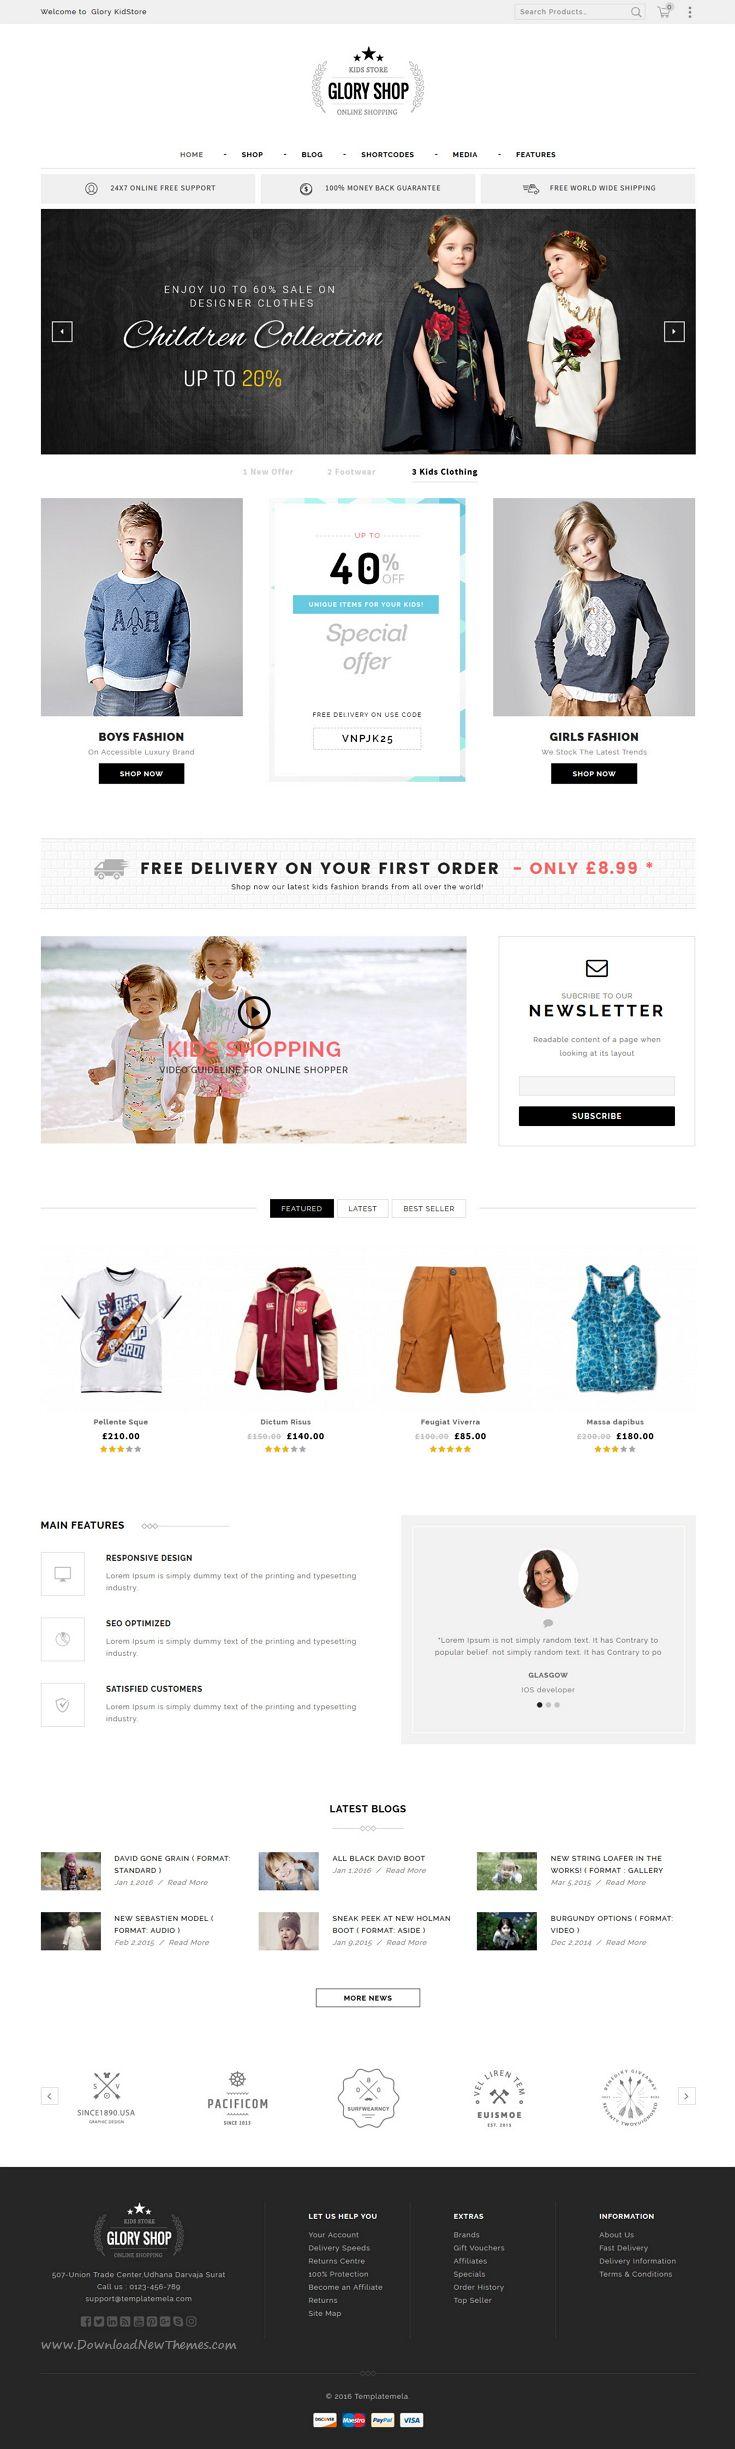 1000 images about web inspiration on pinterest website design